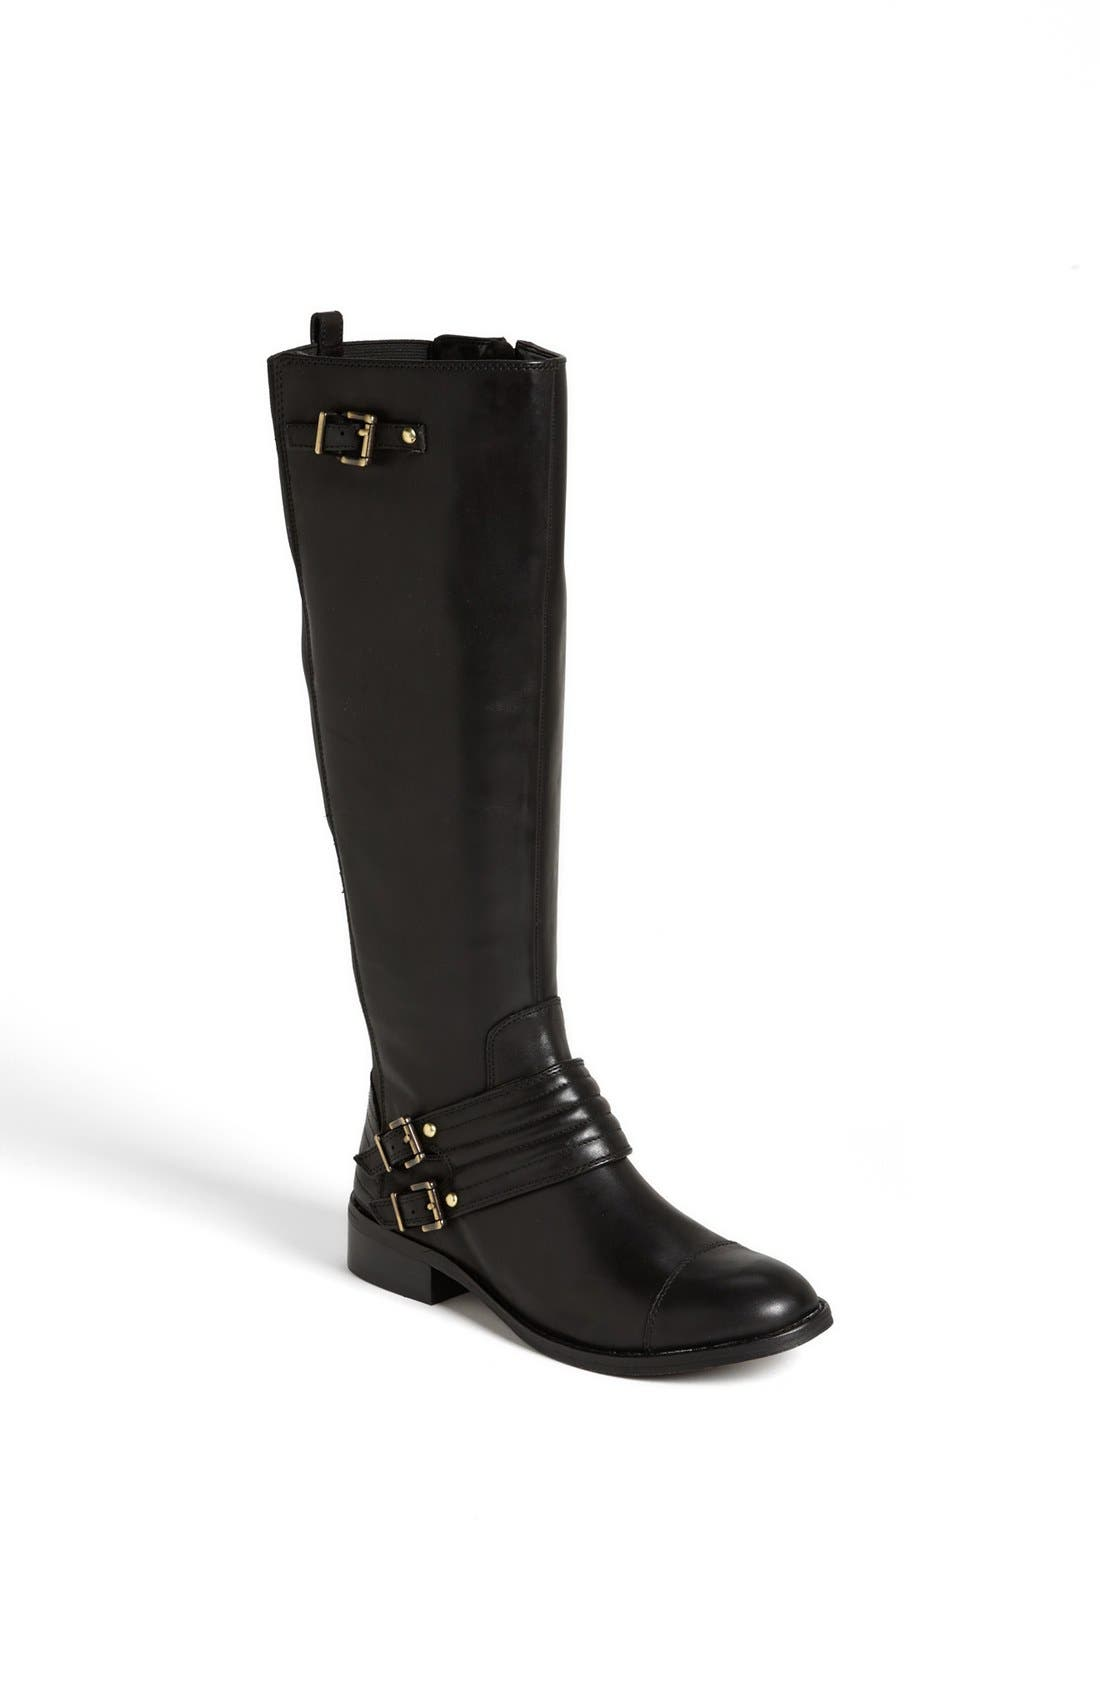 Alternate Image 1 Selected - Jessica Simpson 'Elmont' Boot